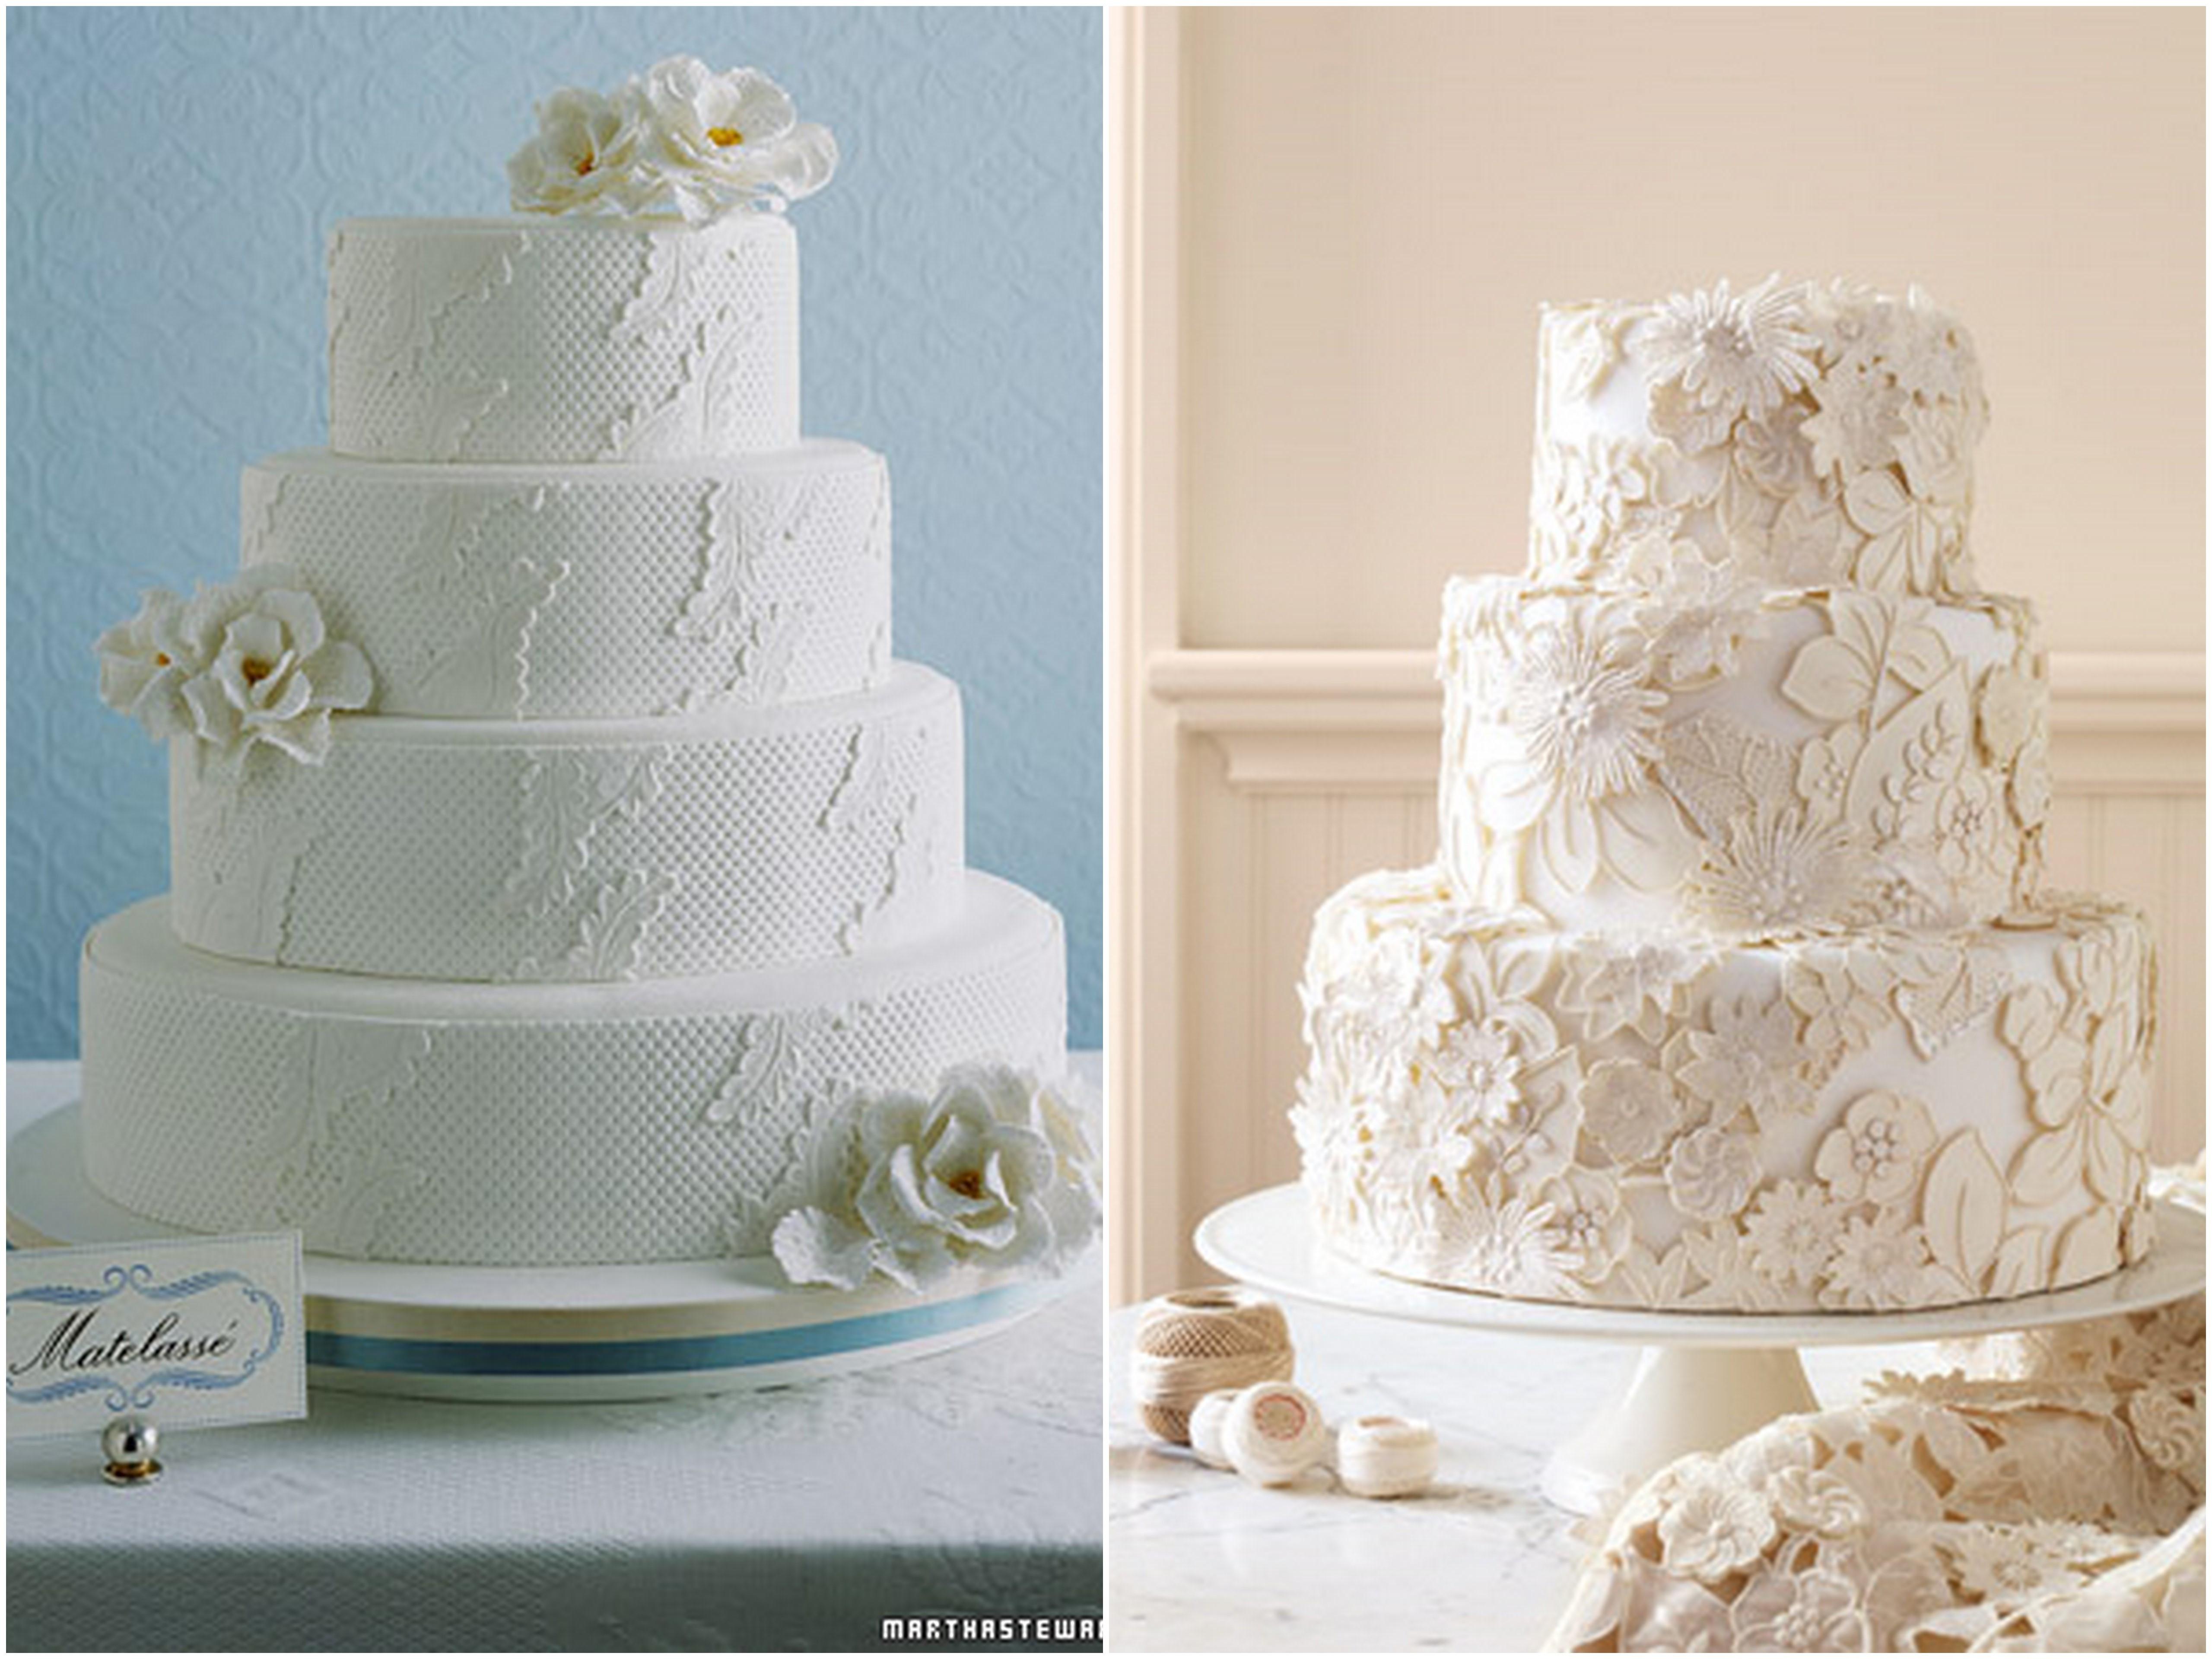 Fondant Wedding Cakes  Inspired by the Great Cake Debate Fondant Vs Buttercream